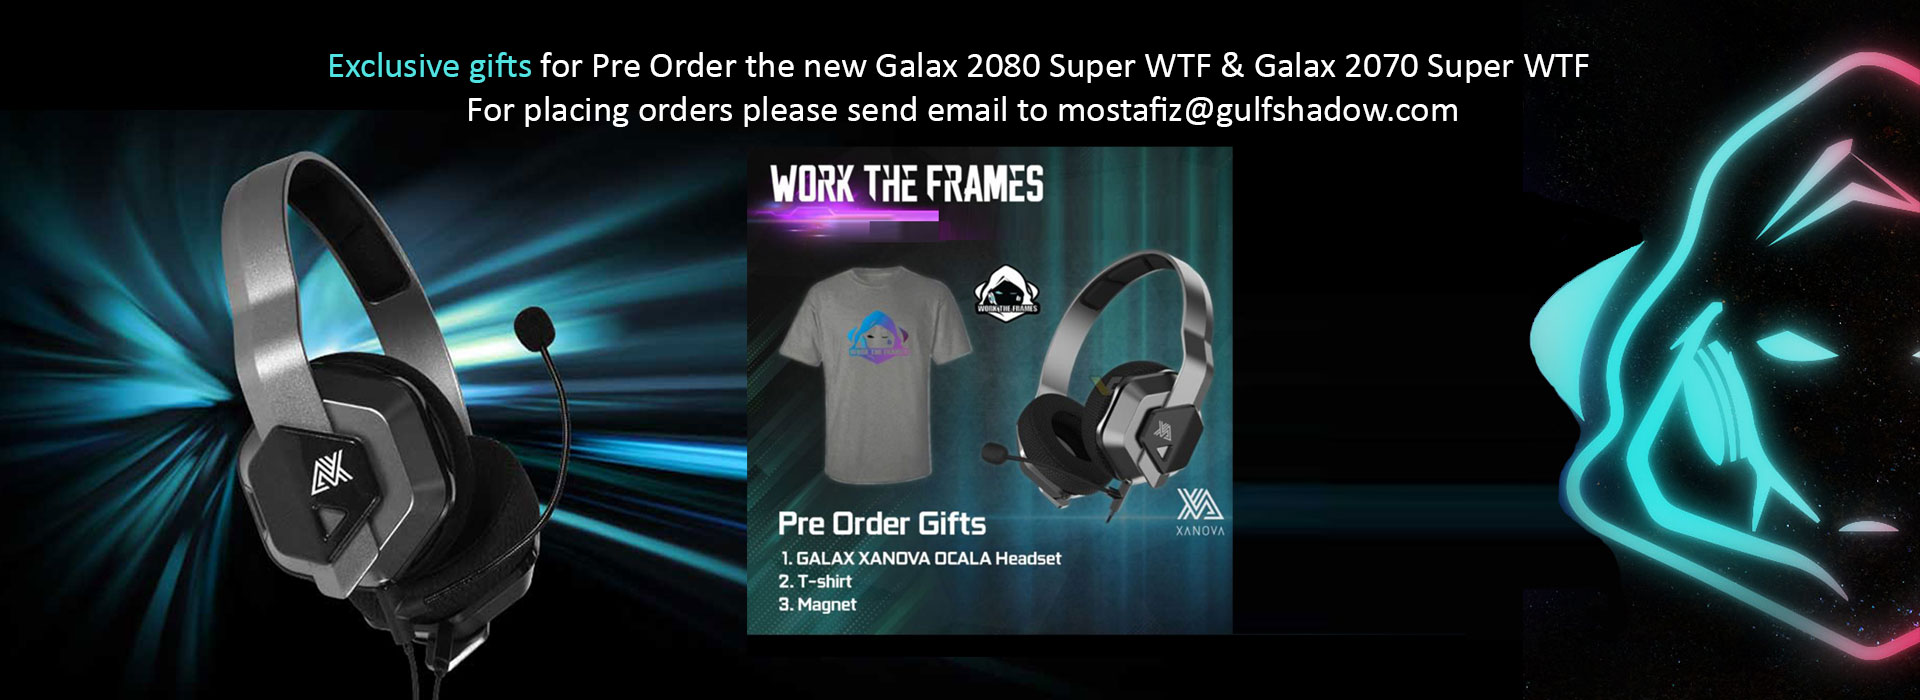 galax-preorder2